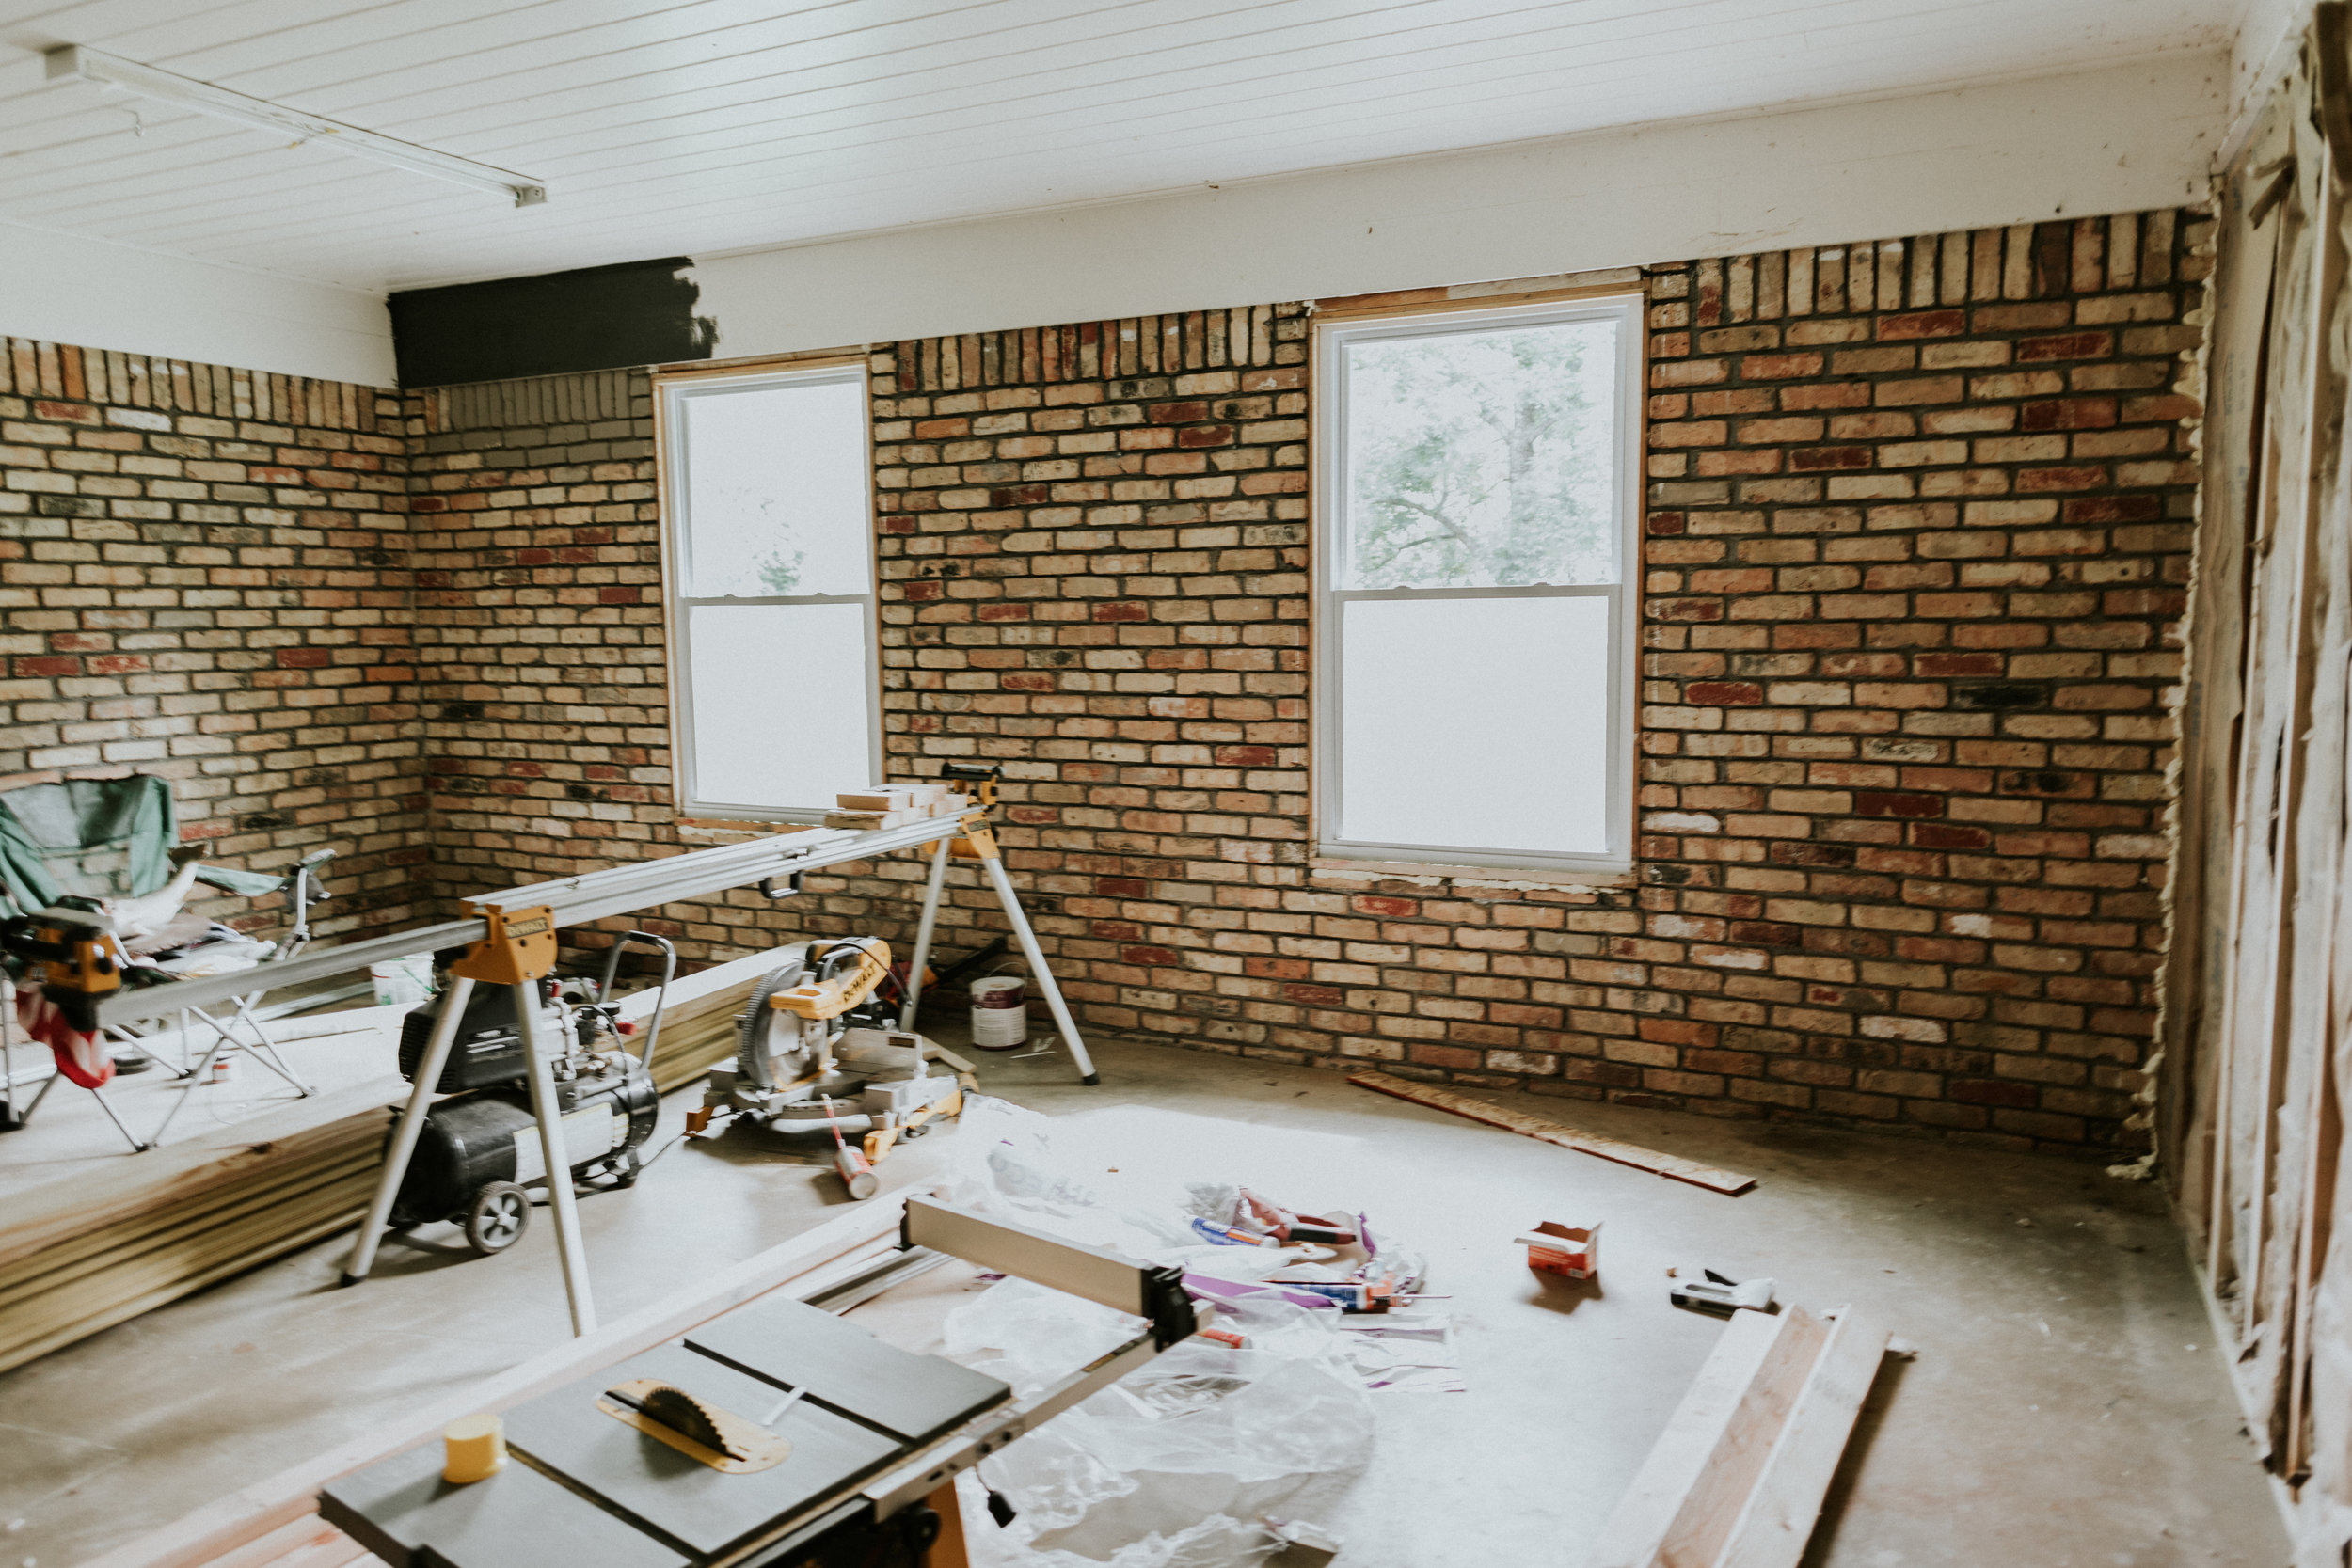 Transforming a garage into a room